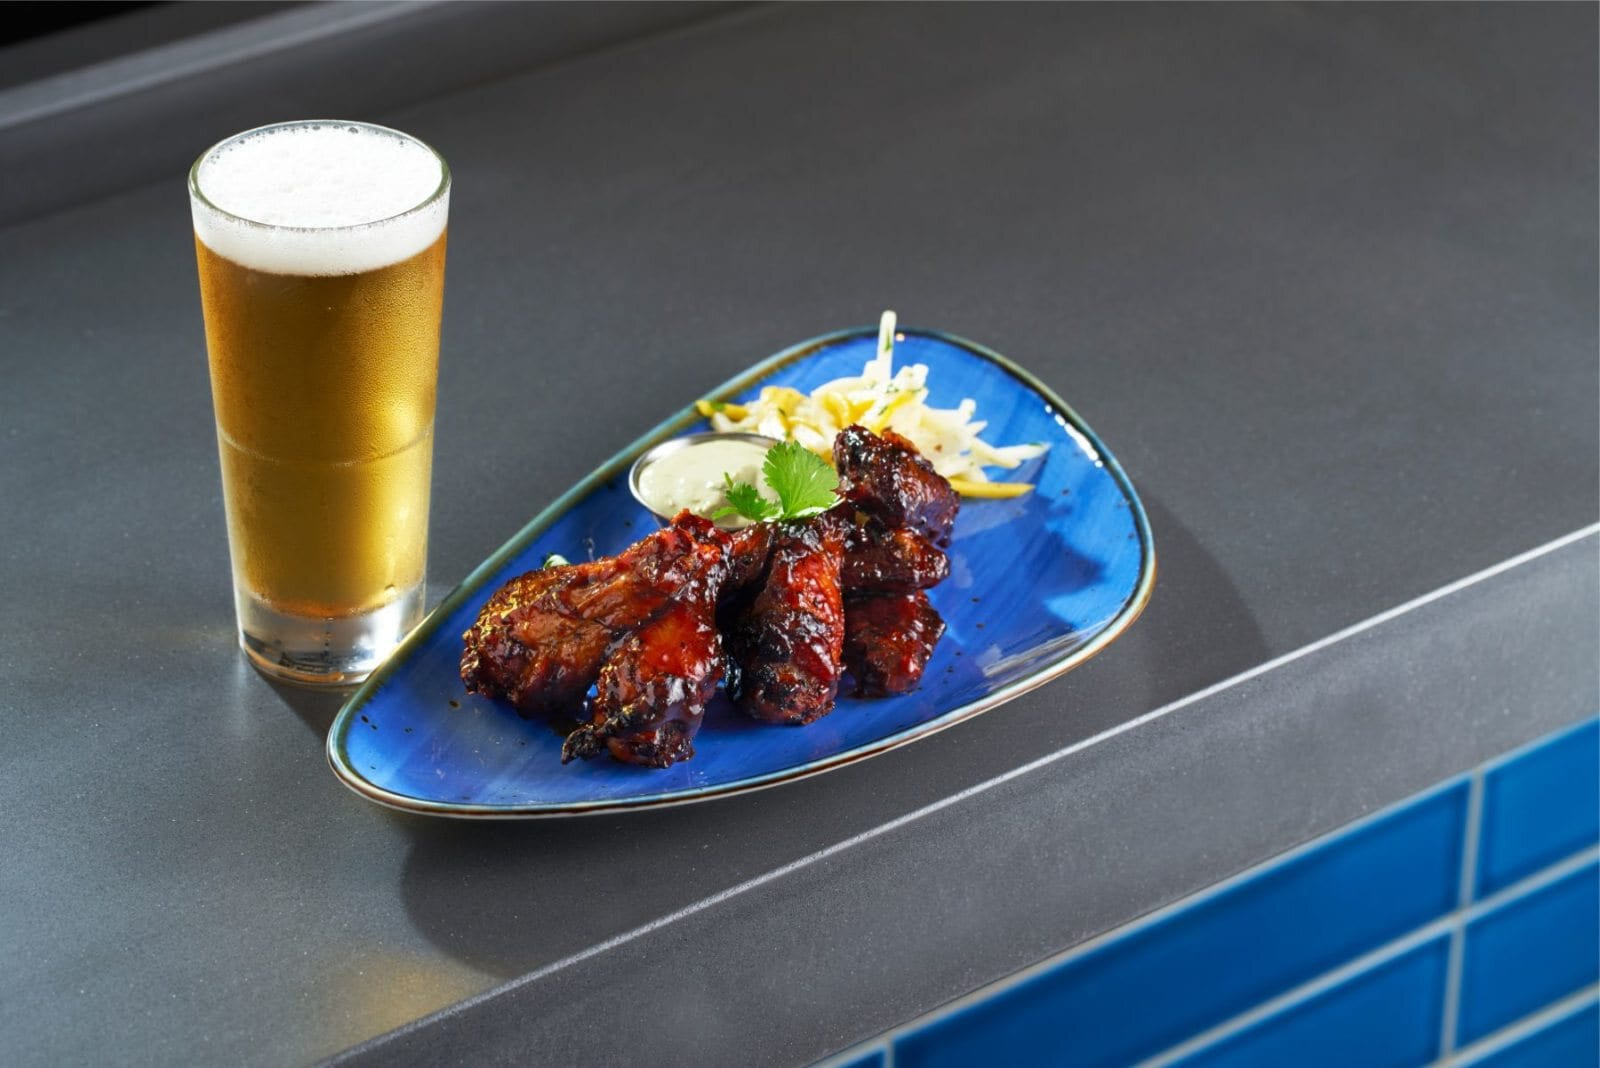 Steelpan's Caribbean Jerk Wings